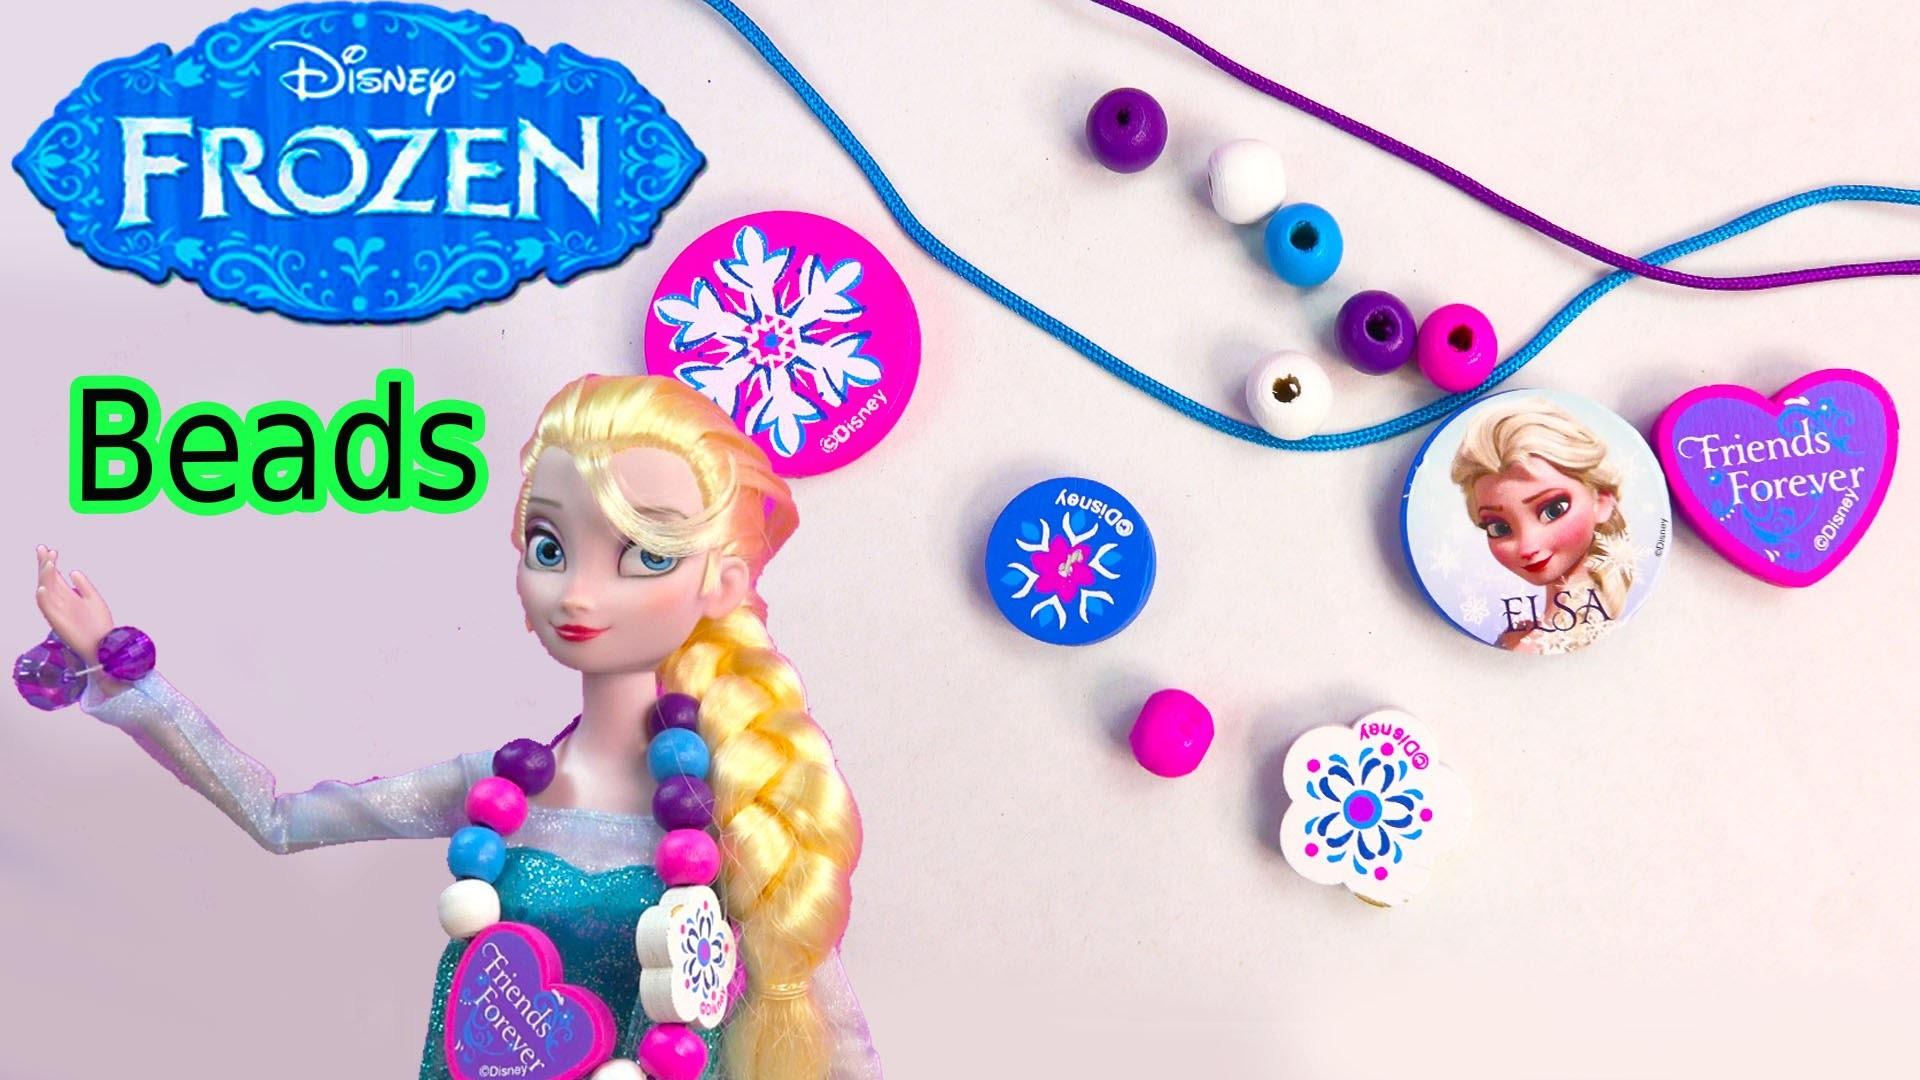 Queen ELSA Wooden Beads Disney Frozen Movie Wood Necklace Craft & Activity Book Playset Toy Unboxing